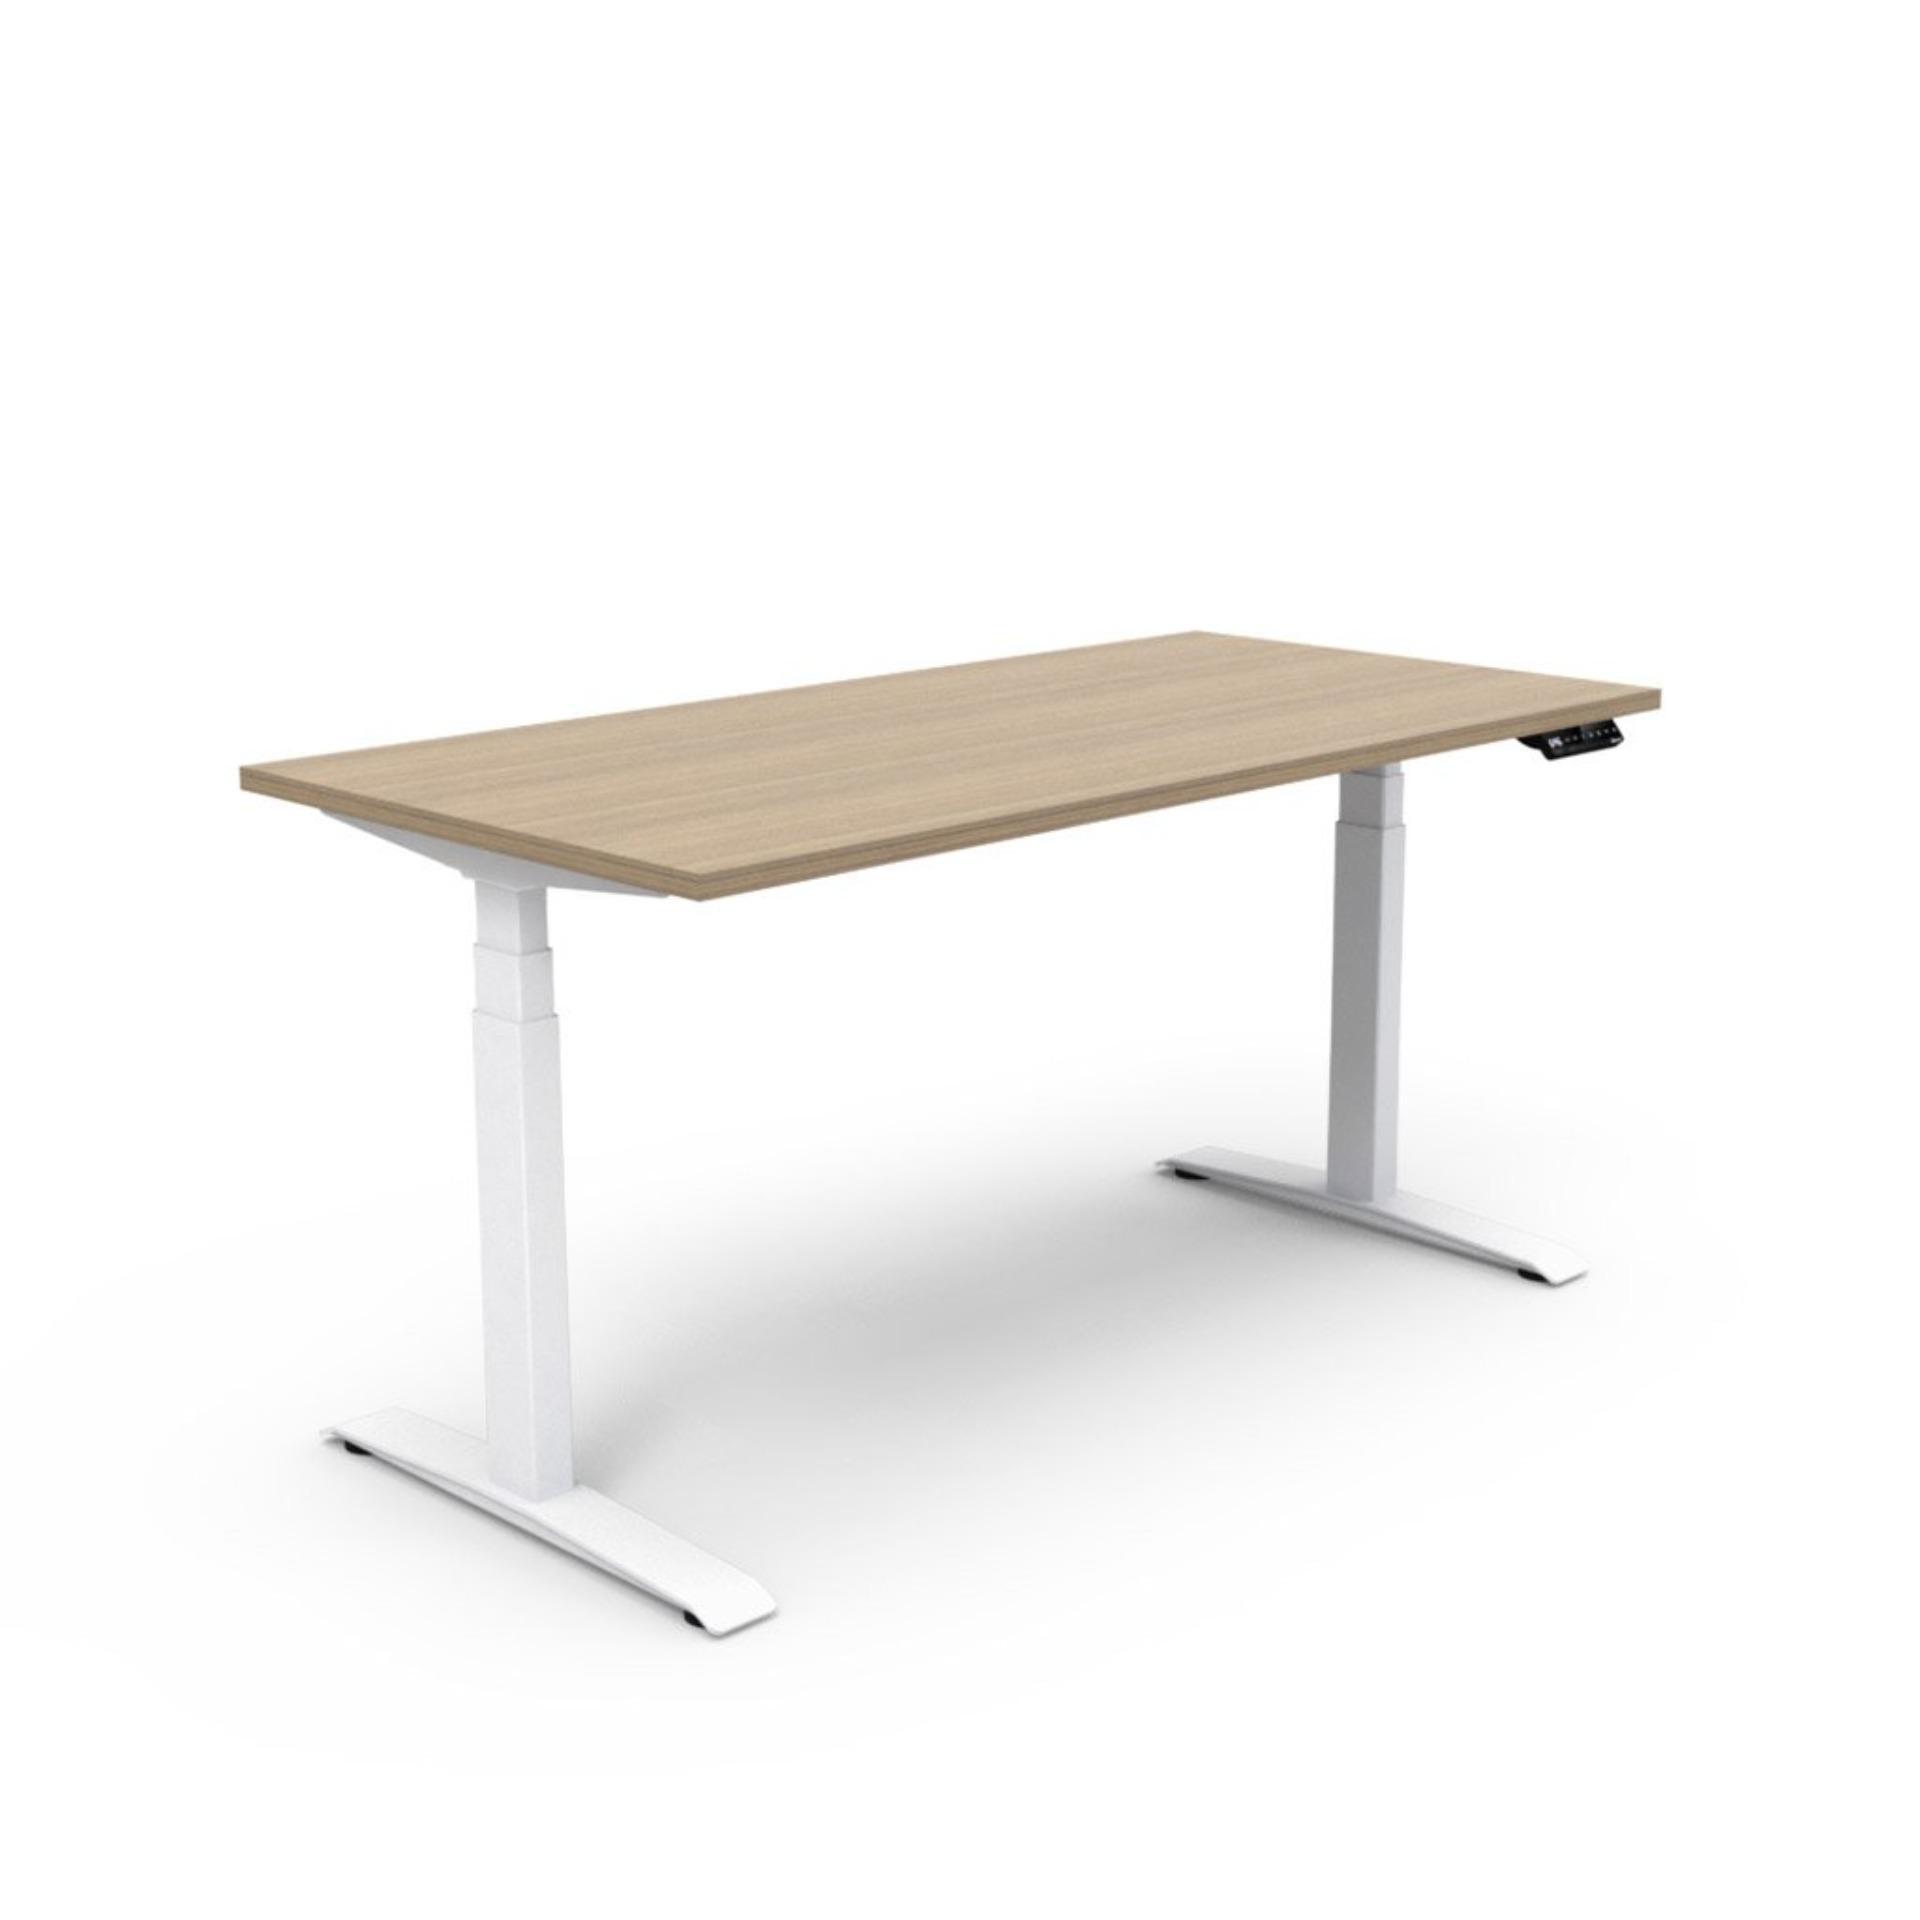 Delightful Benel Adjust Rectangular Height Adjustable Table (75cm X 180cm) Singapore